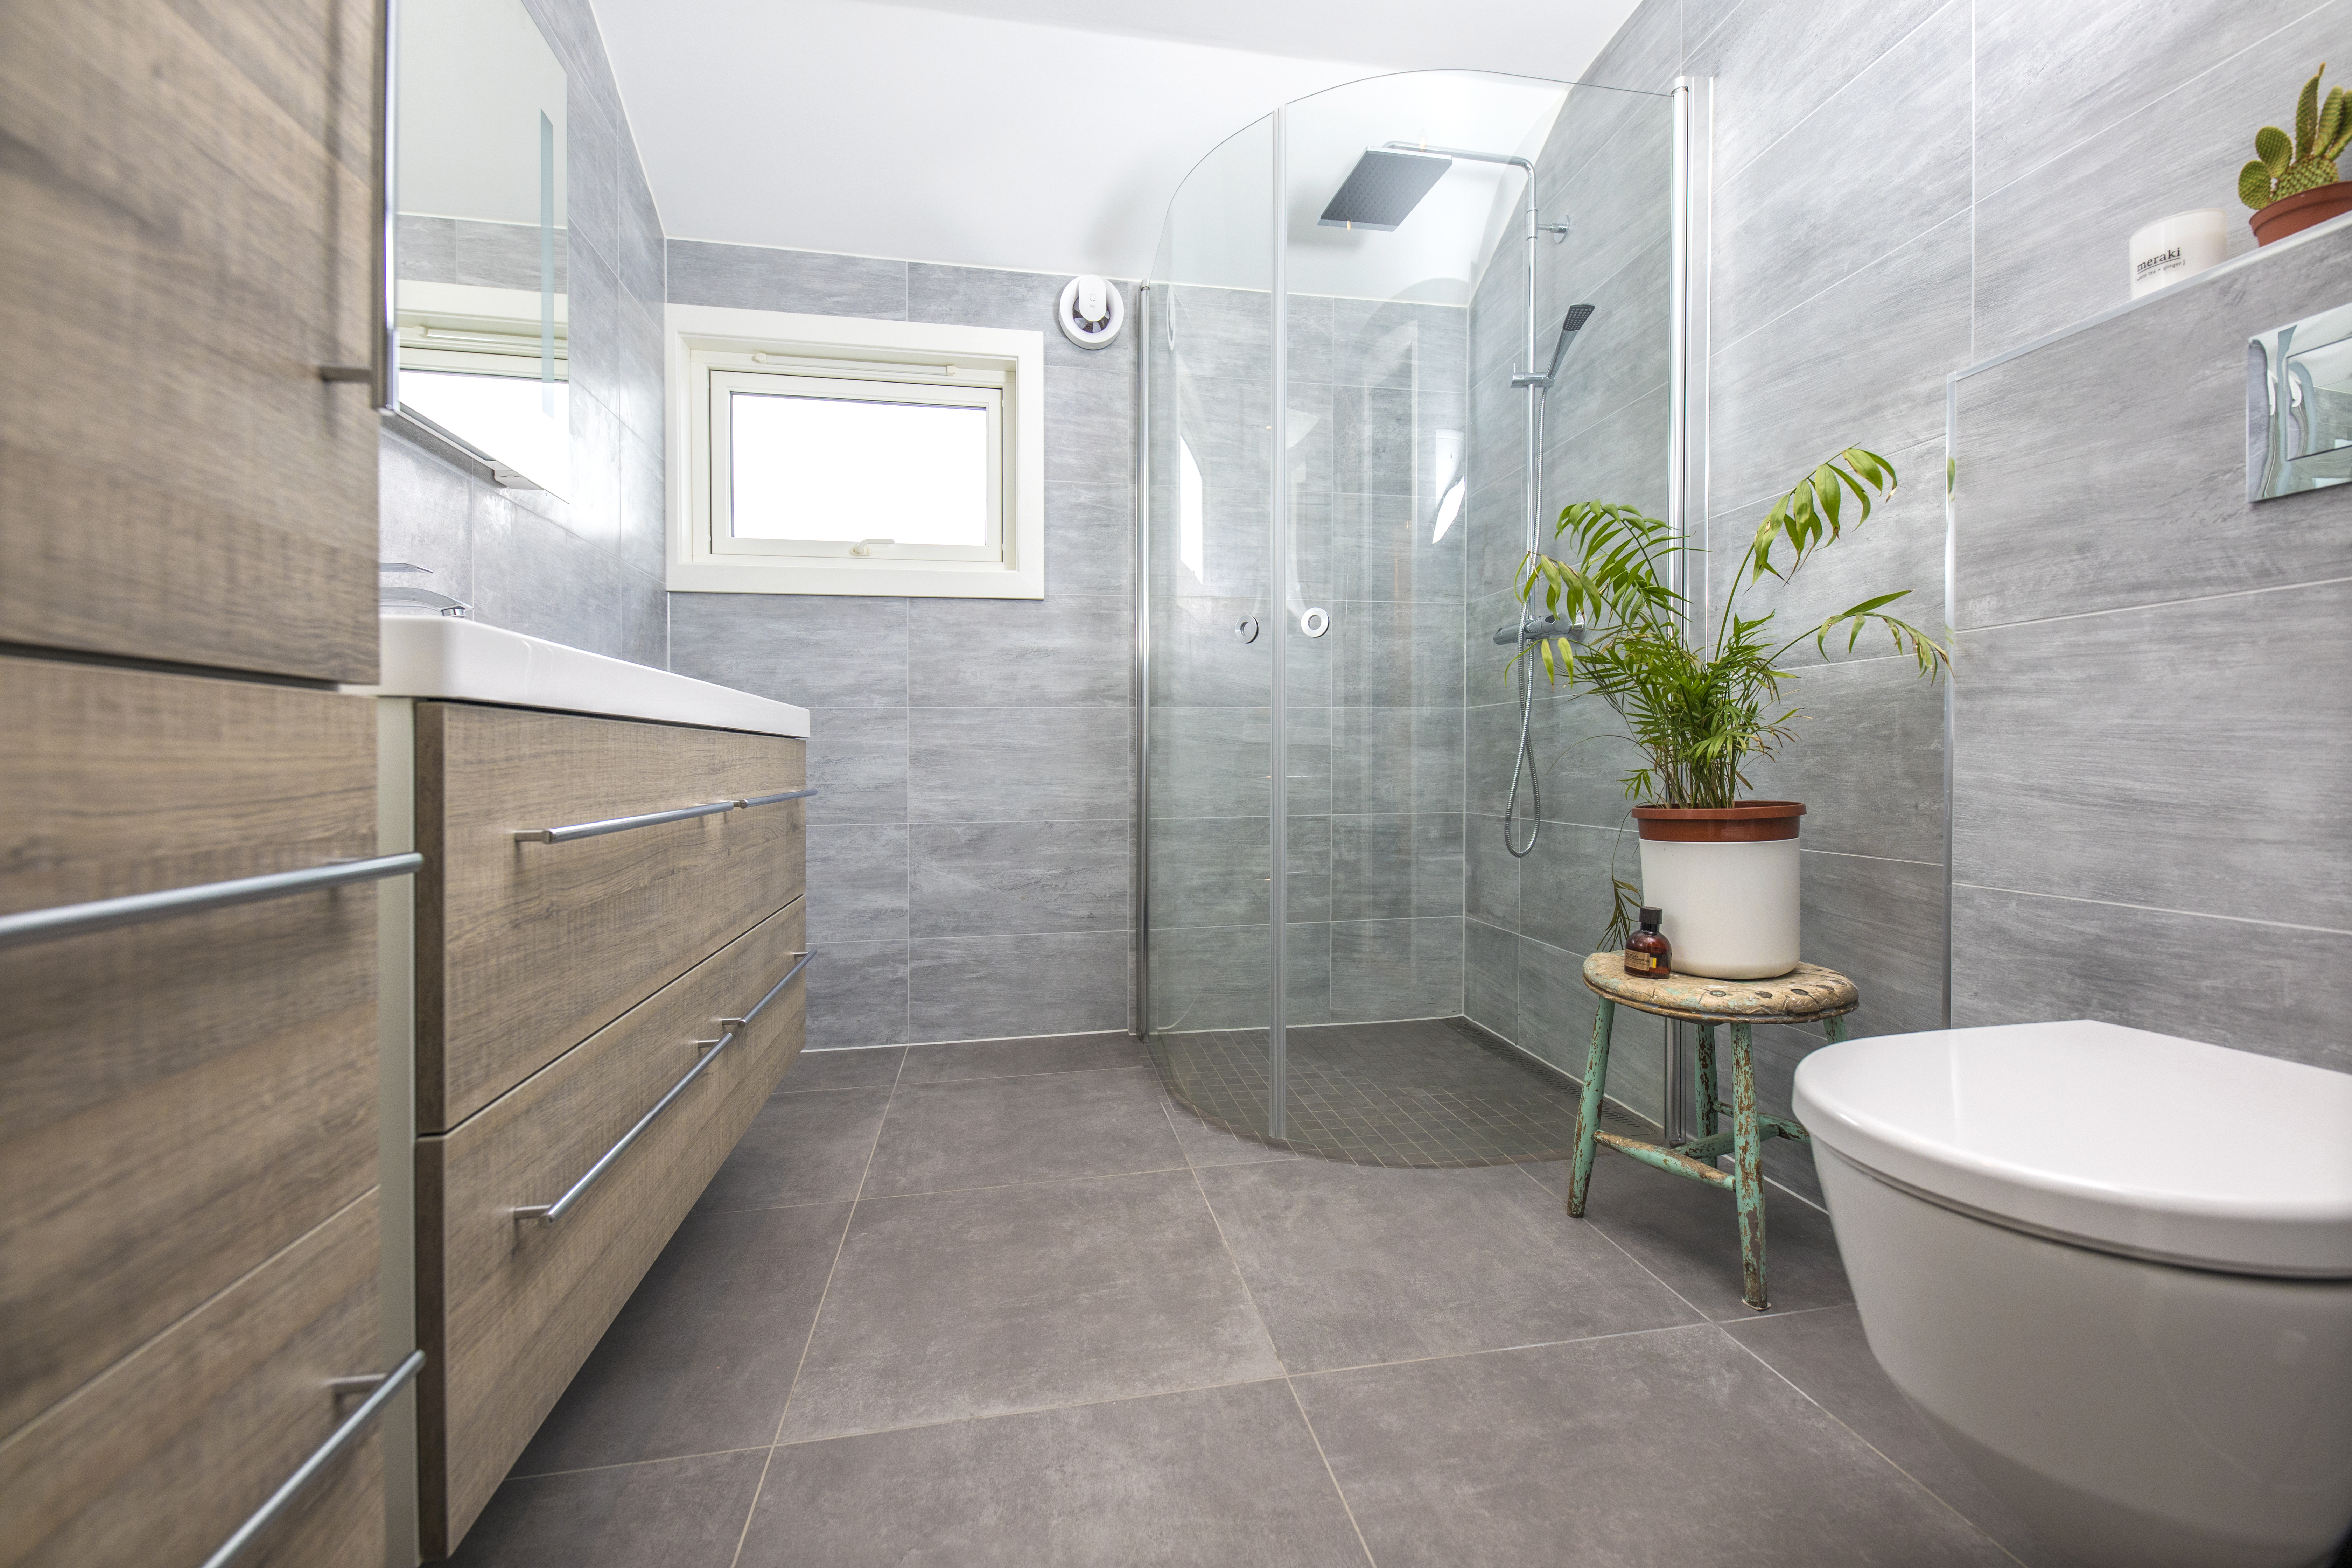 Nyoppusset grått bad med dusjhjørne